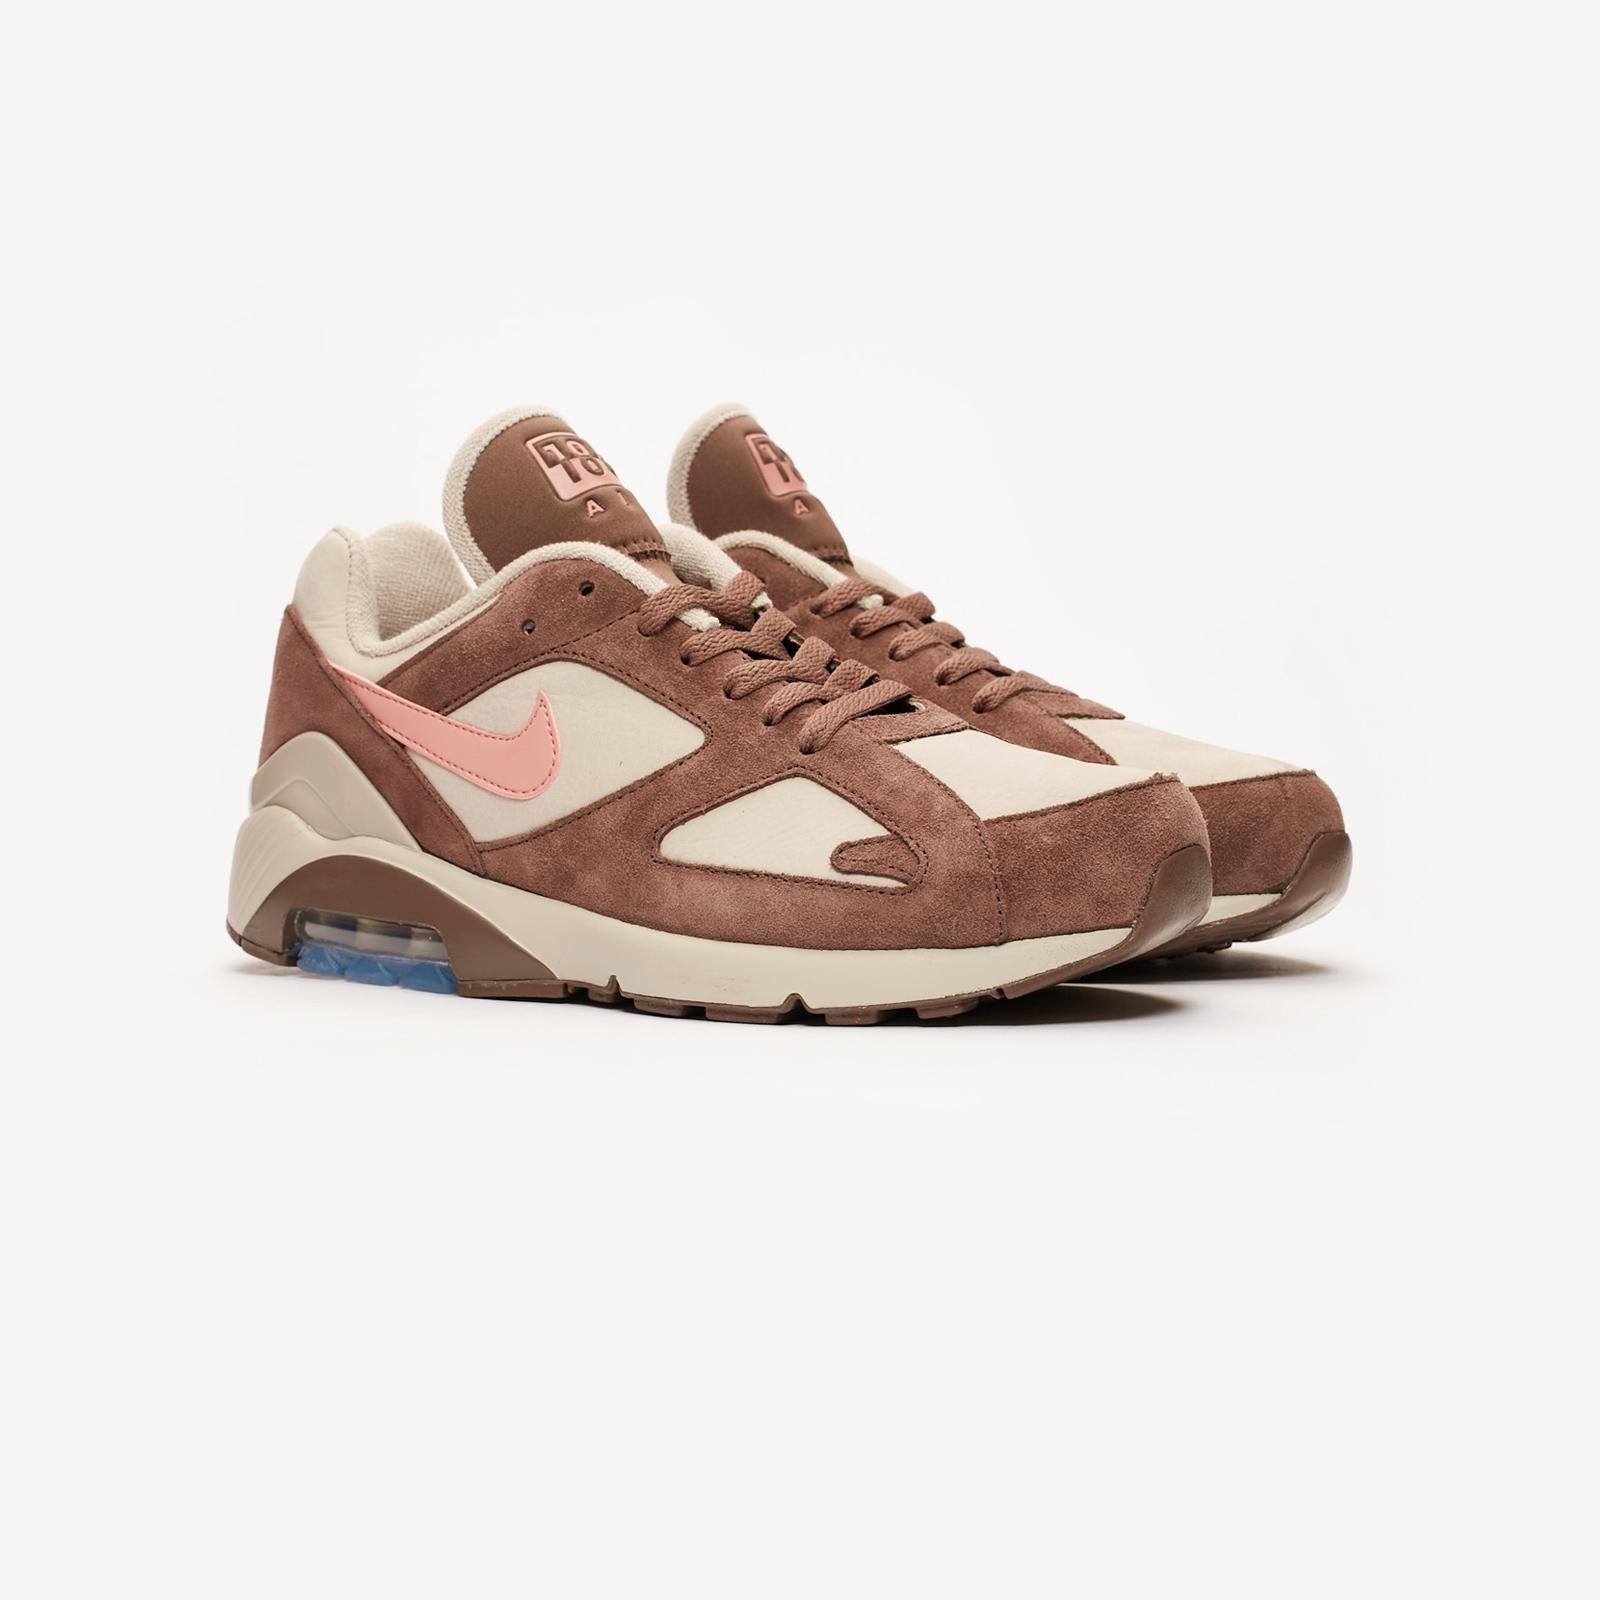 size 40 84c65 25fa3 Nike Sportswear Air Max 180